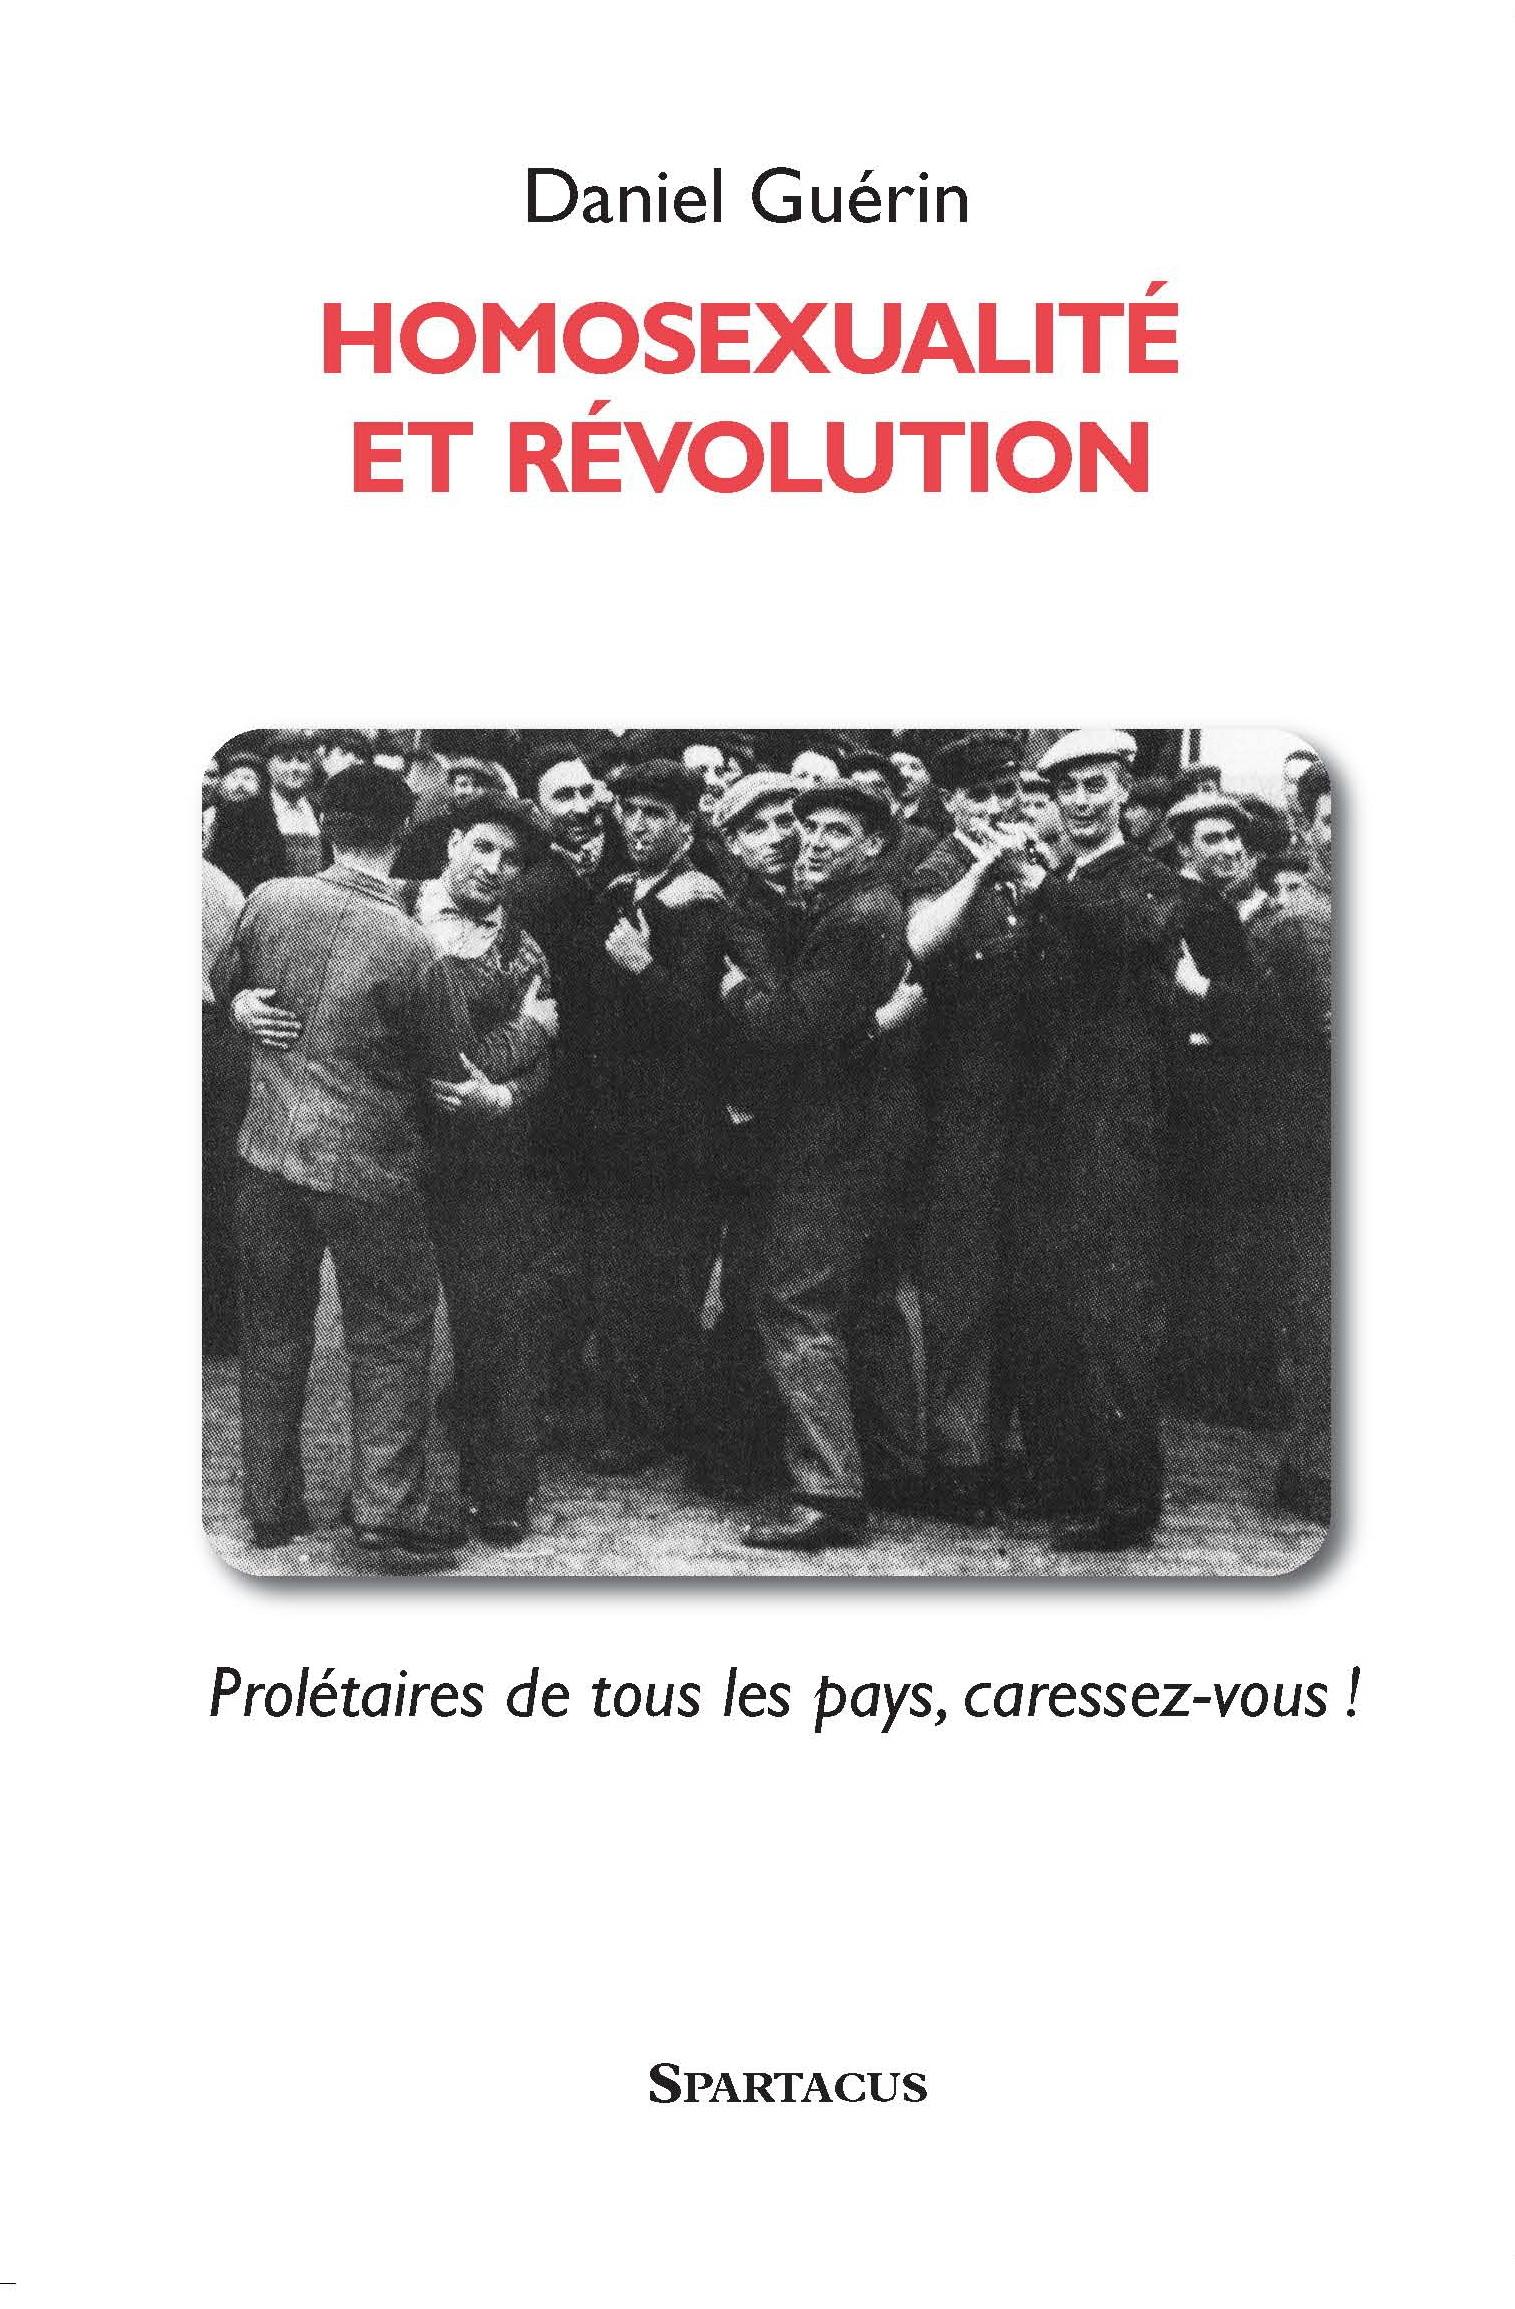 HOMOSEXUALITE ET REVOLUTION